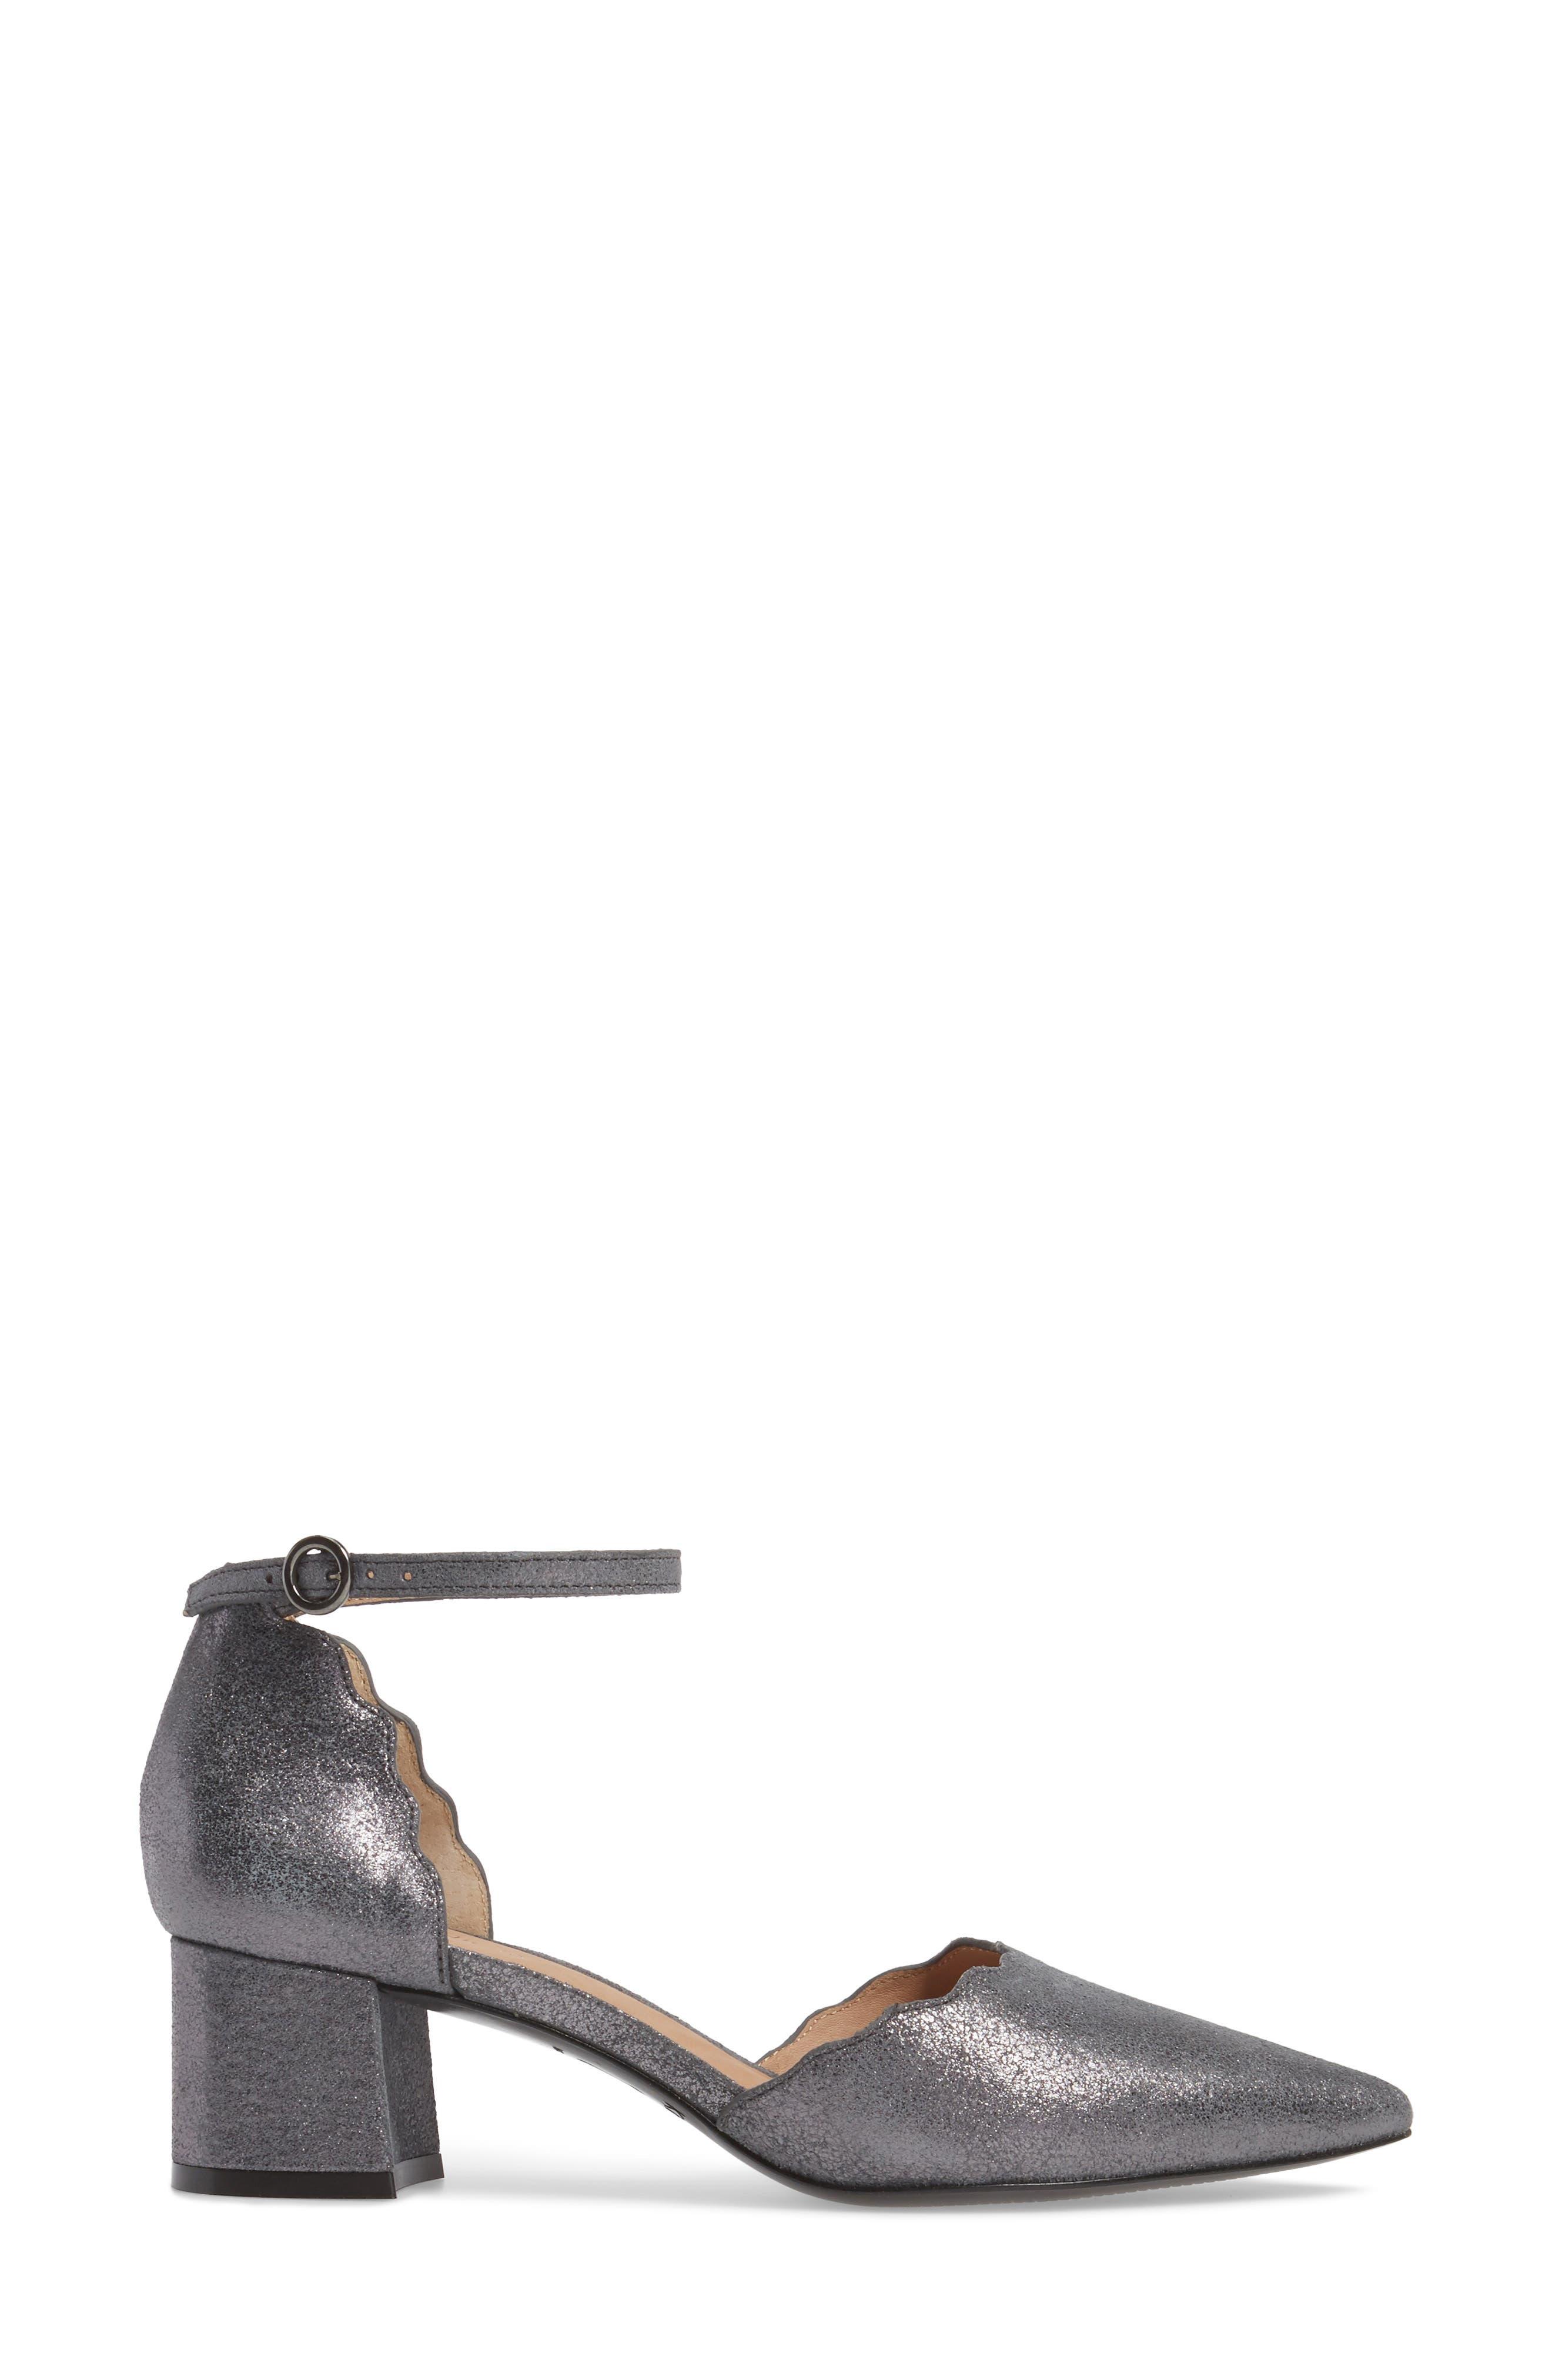 Roseia Pump,                             Alternate thumbnail 3, color,                             Gunmetal Suede